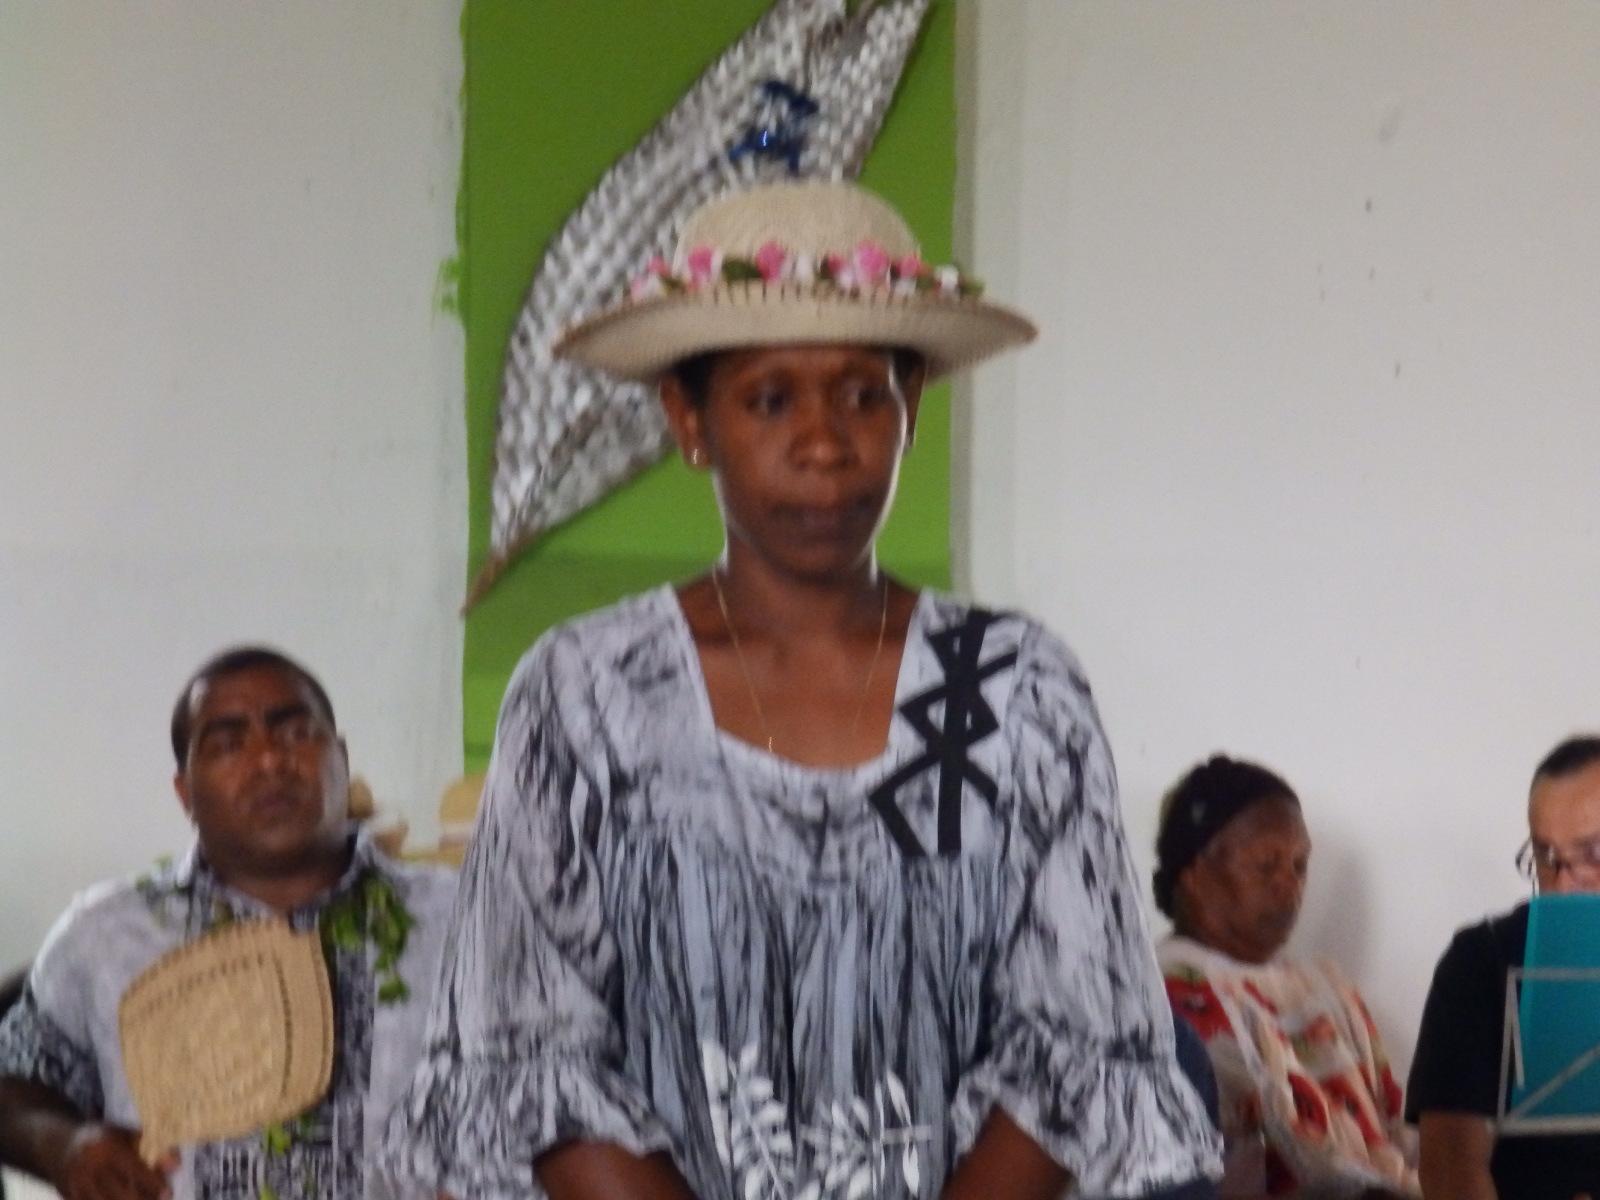 MAHO Hnaxuitra exercera son ministère dans la région de Drehu